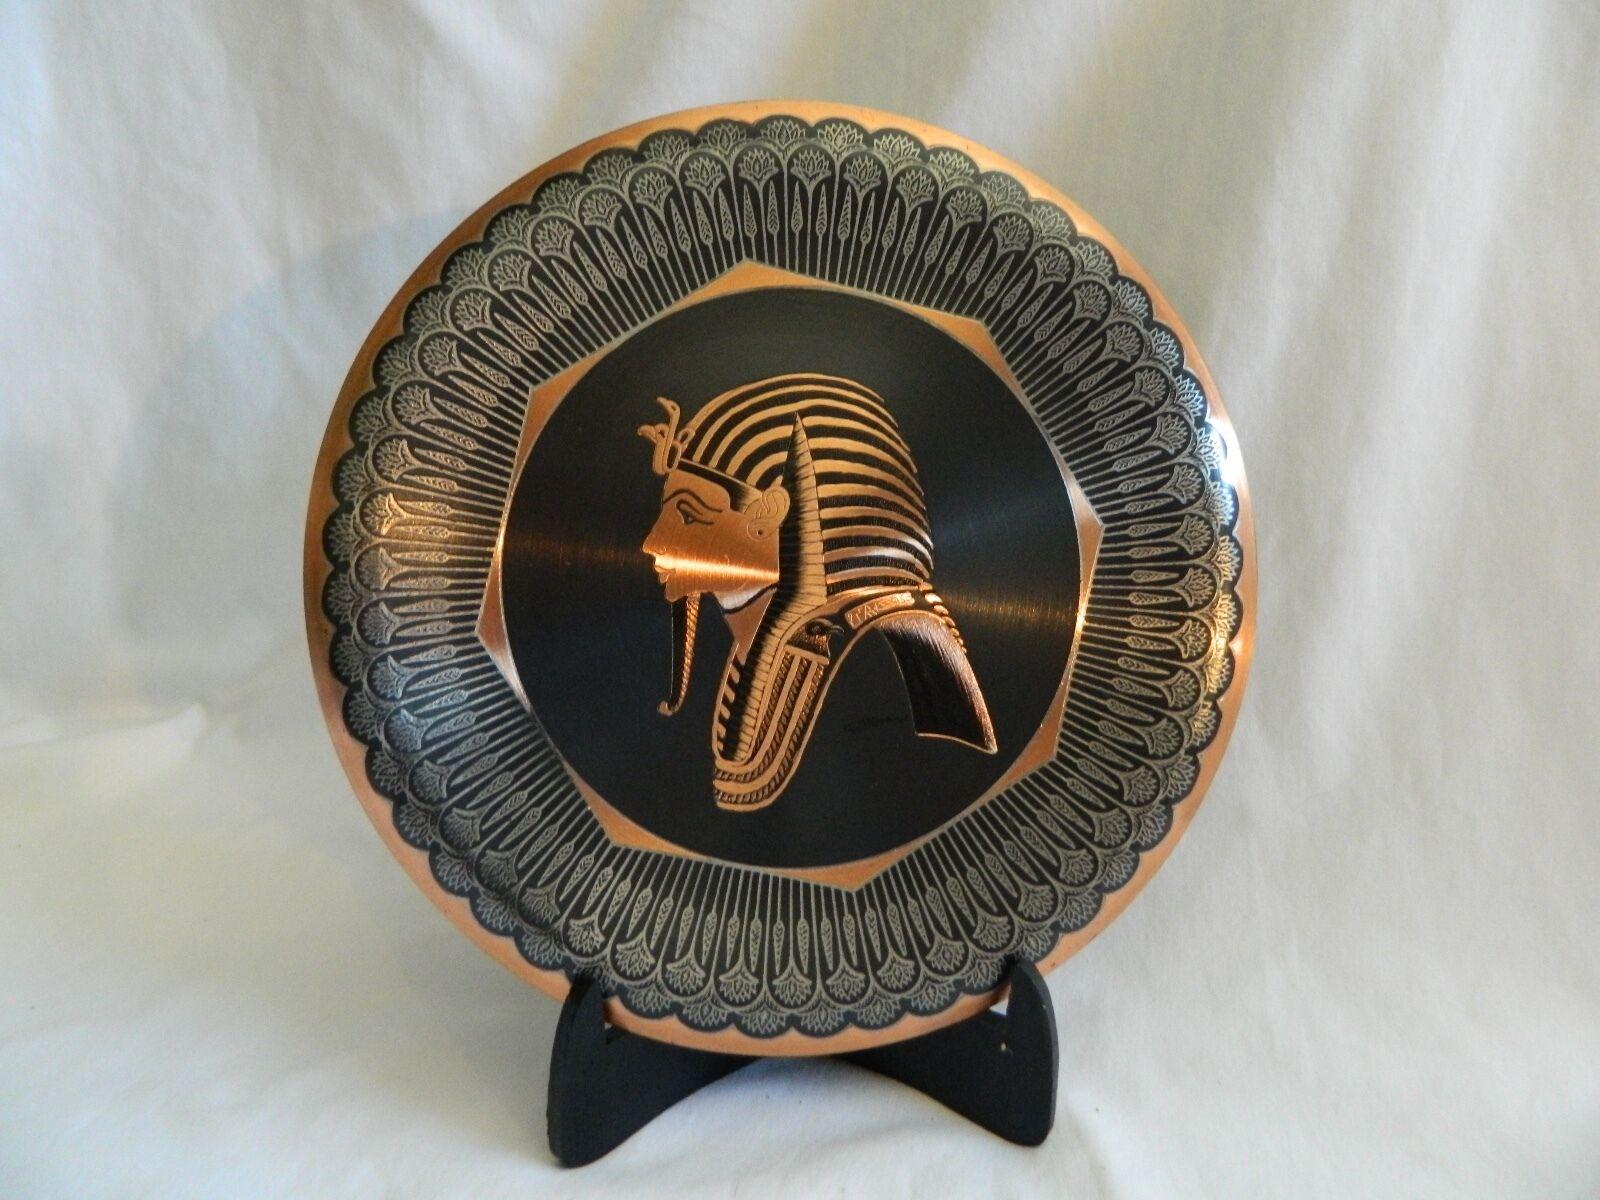 Ägyptisch Kupfer Versilbert Dekor Platte König Hochwertig 25.4cm